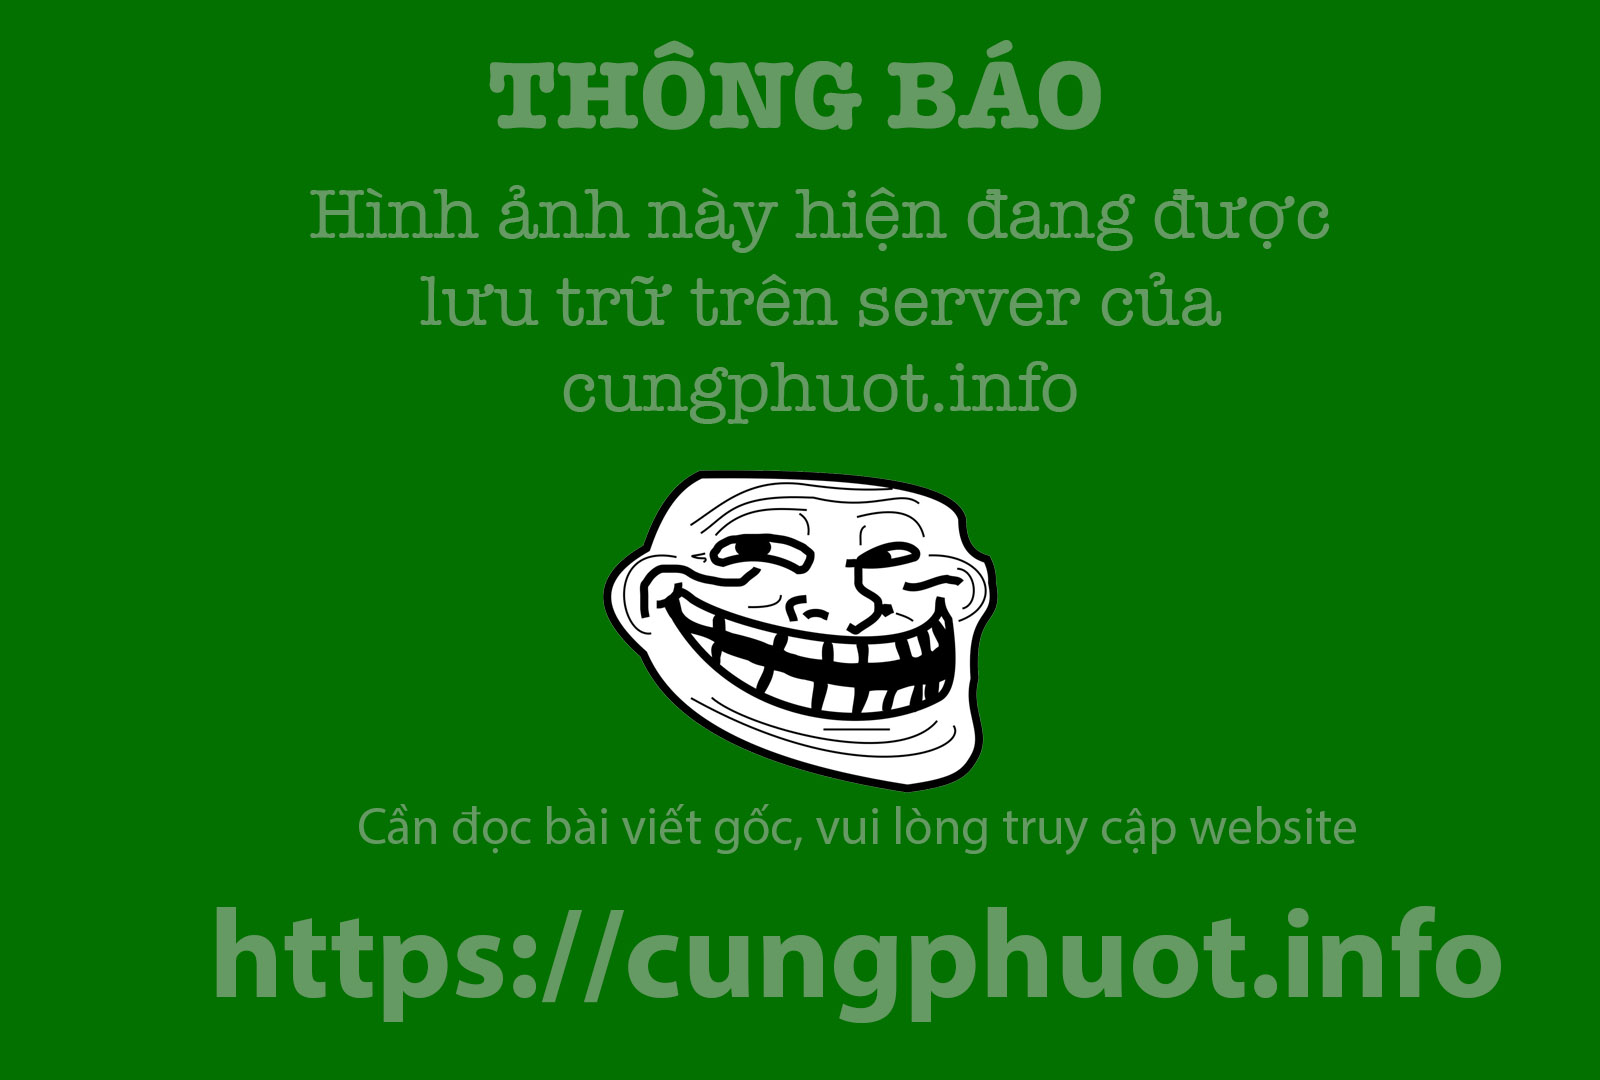 Binh minh tuyet dep tren nhung doi che Tan Cuong hinh anh 4